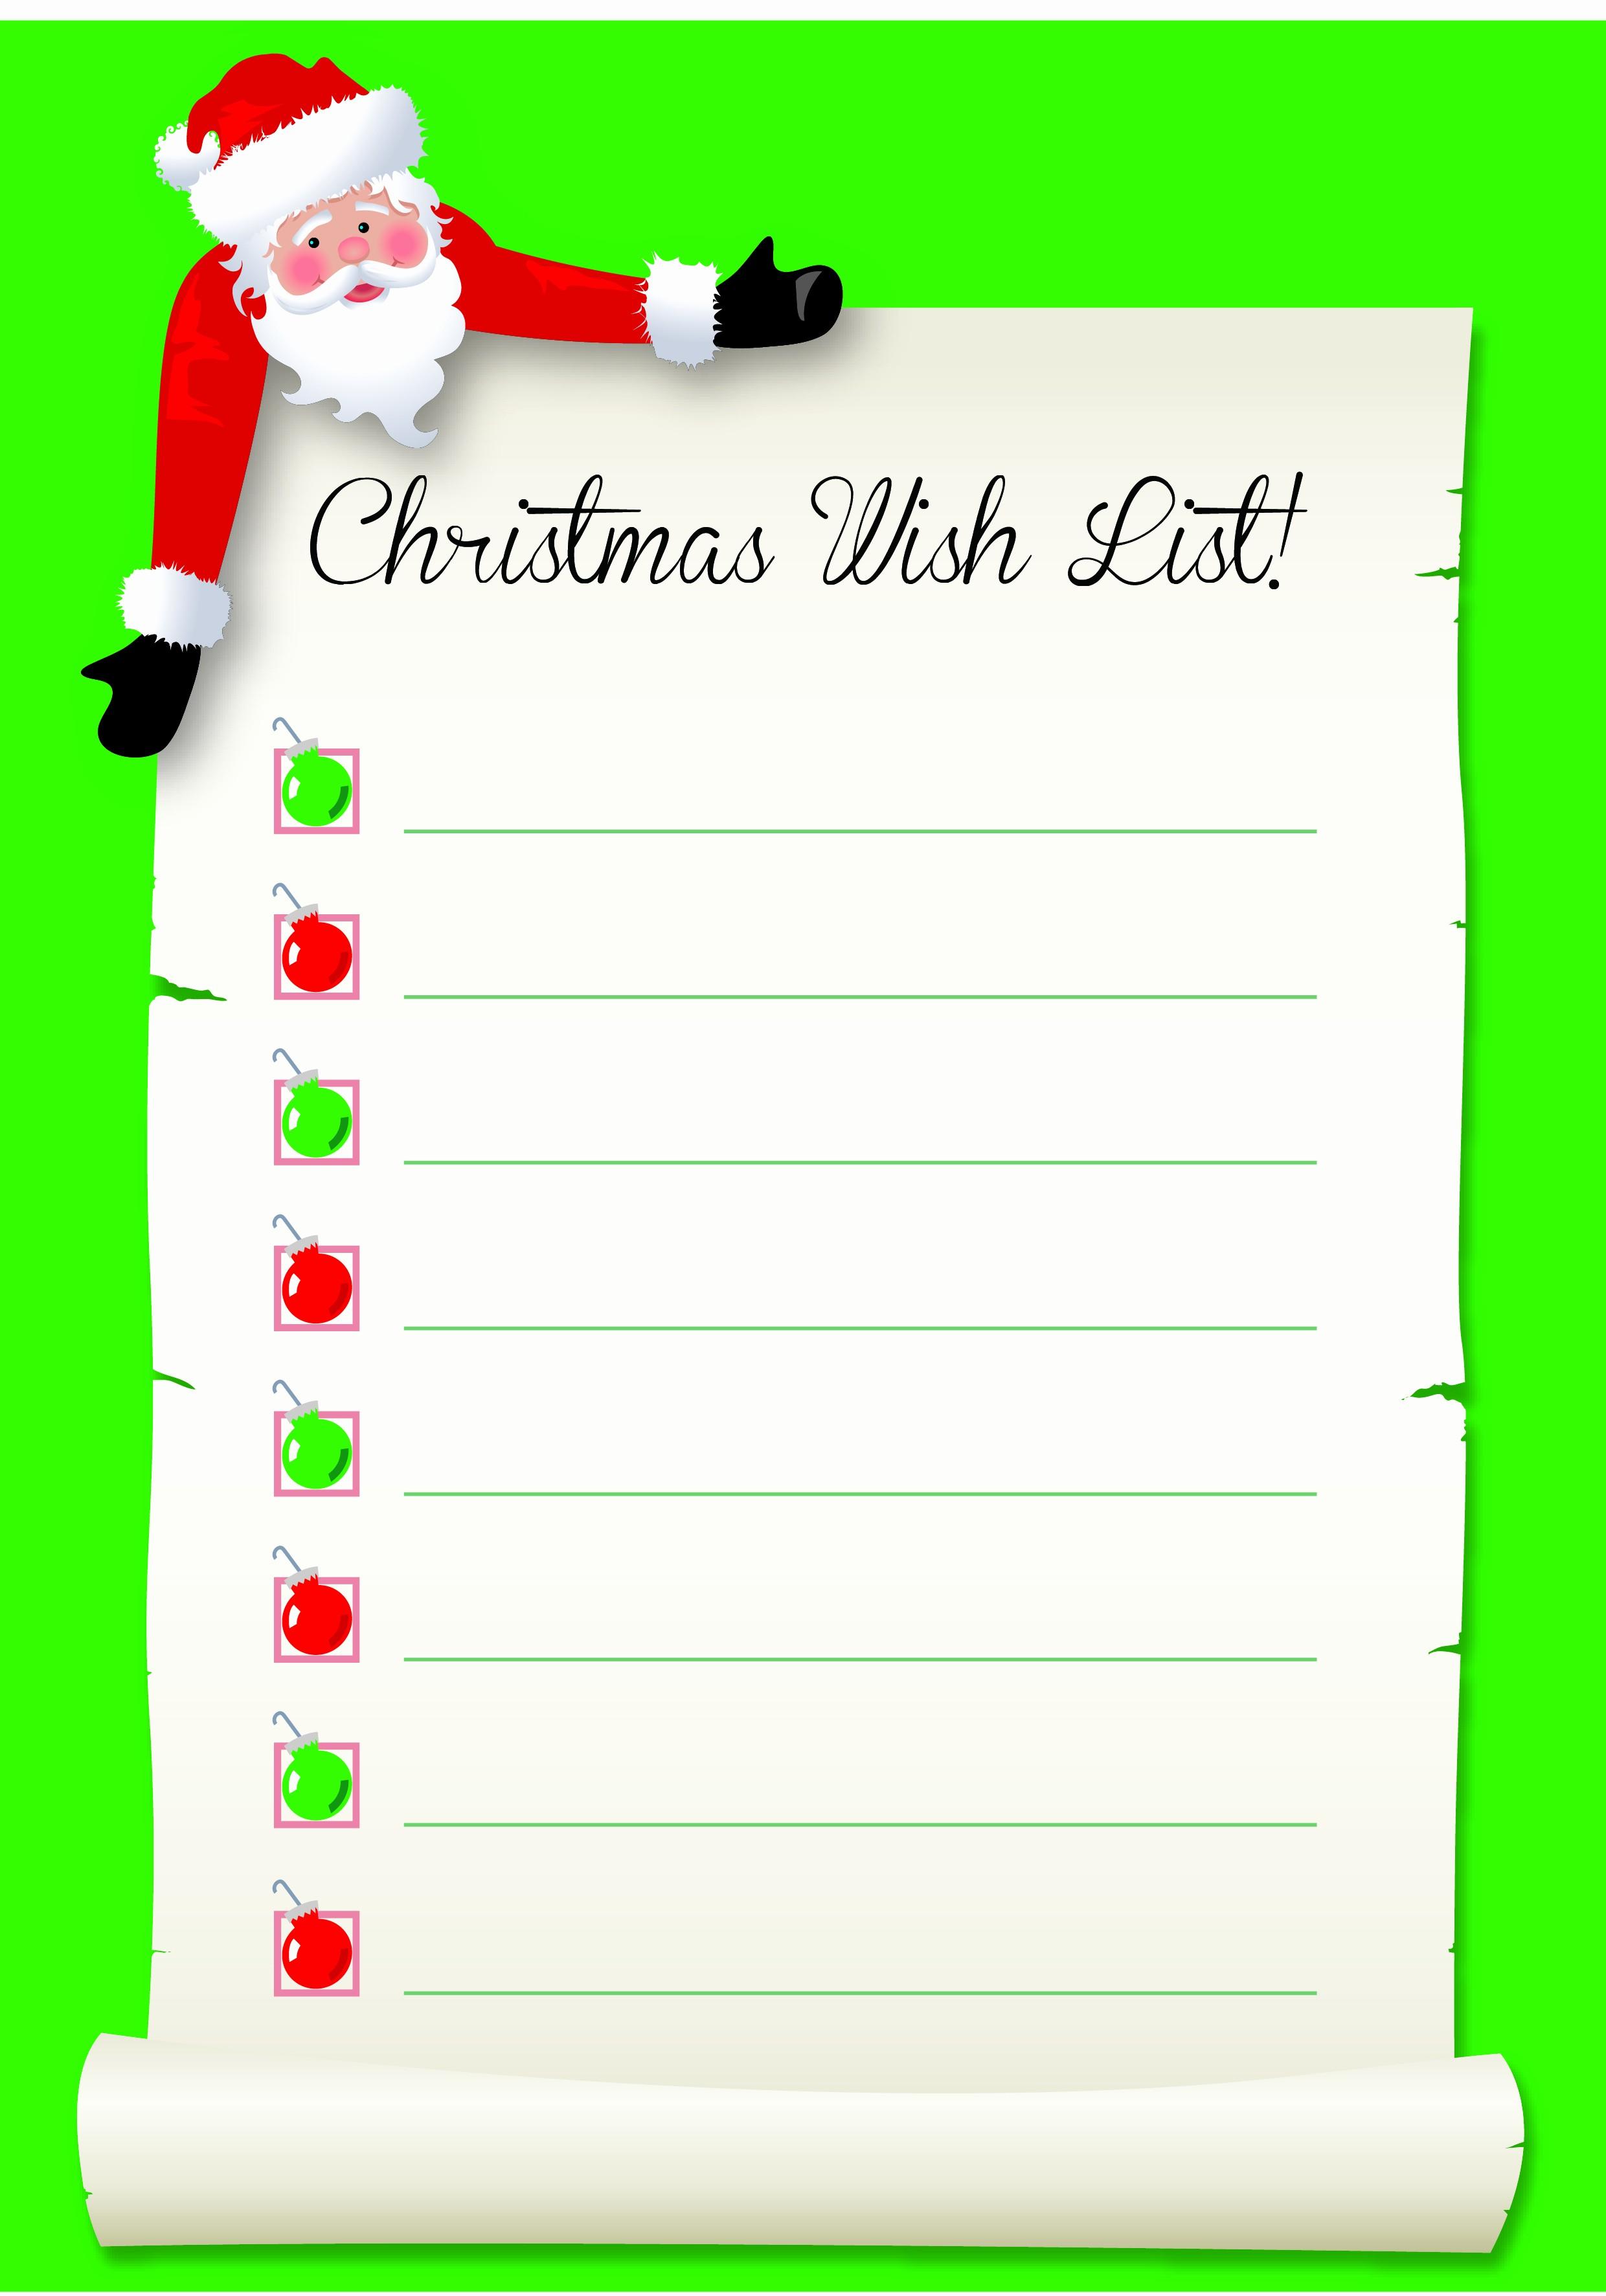 Wish List Template Microsoft Word Awesome Free Stuff